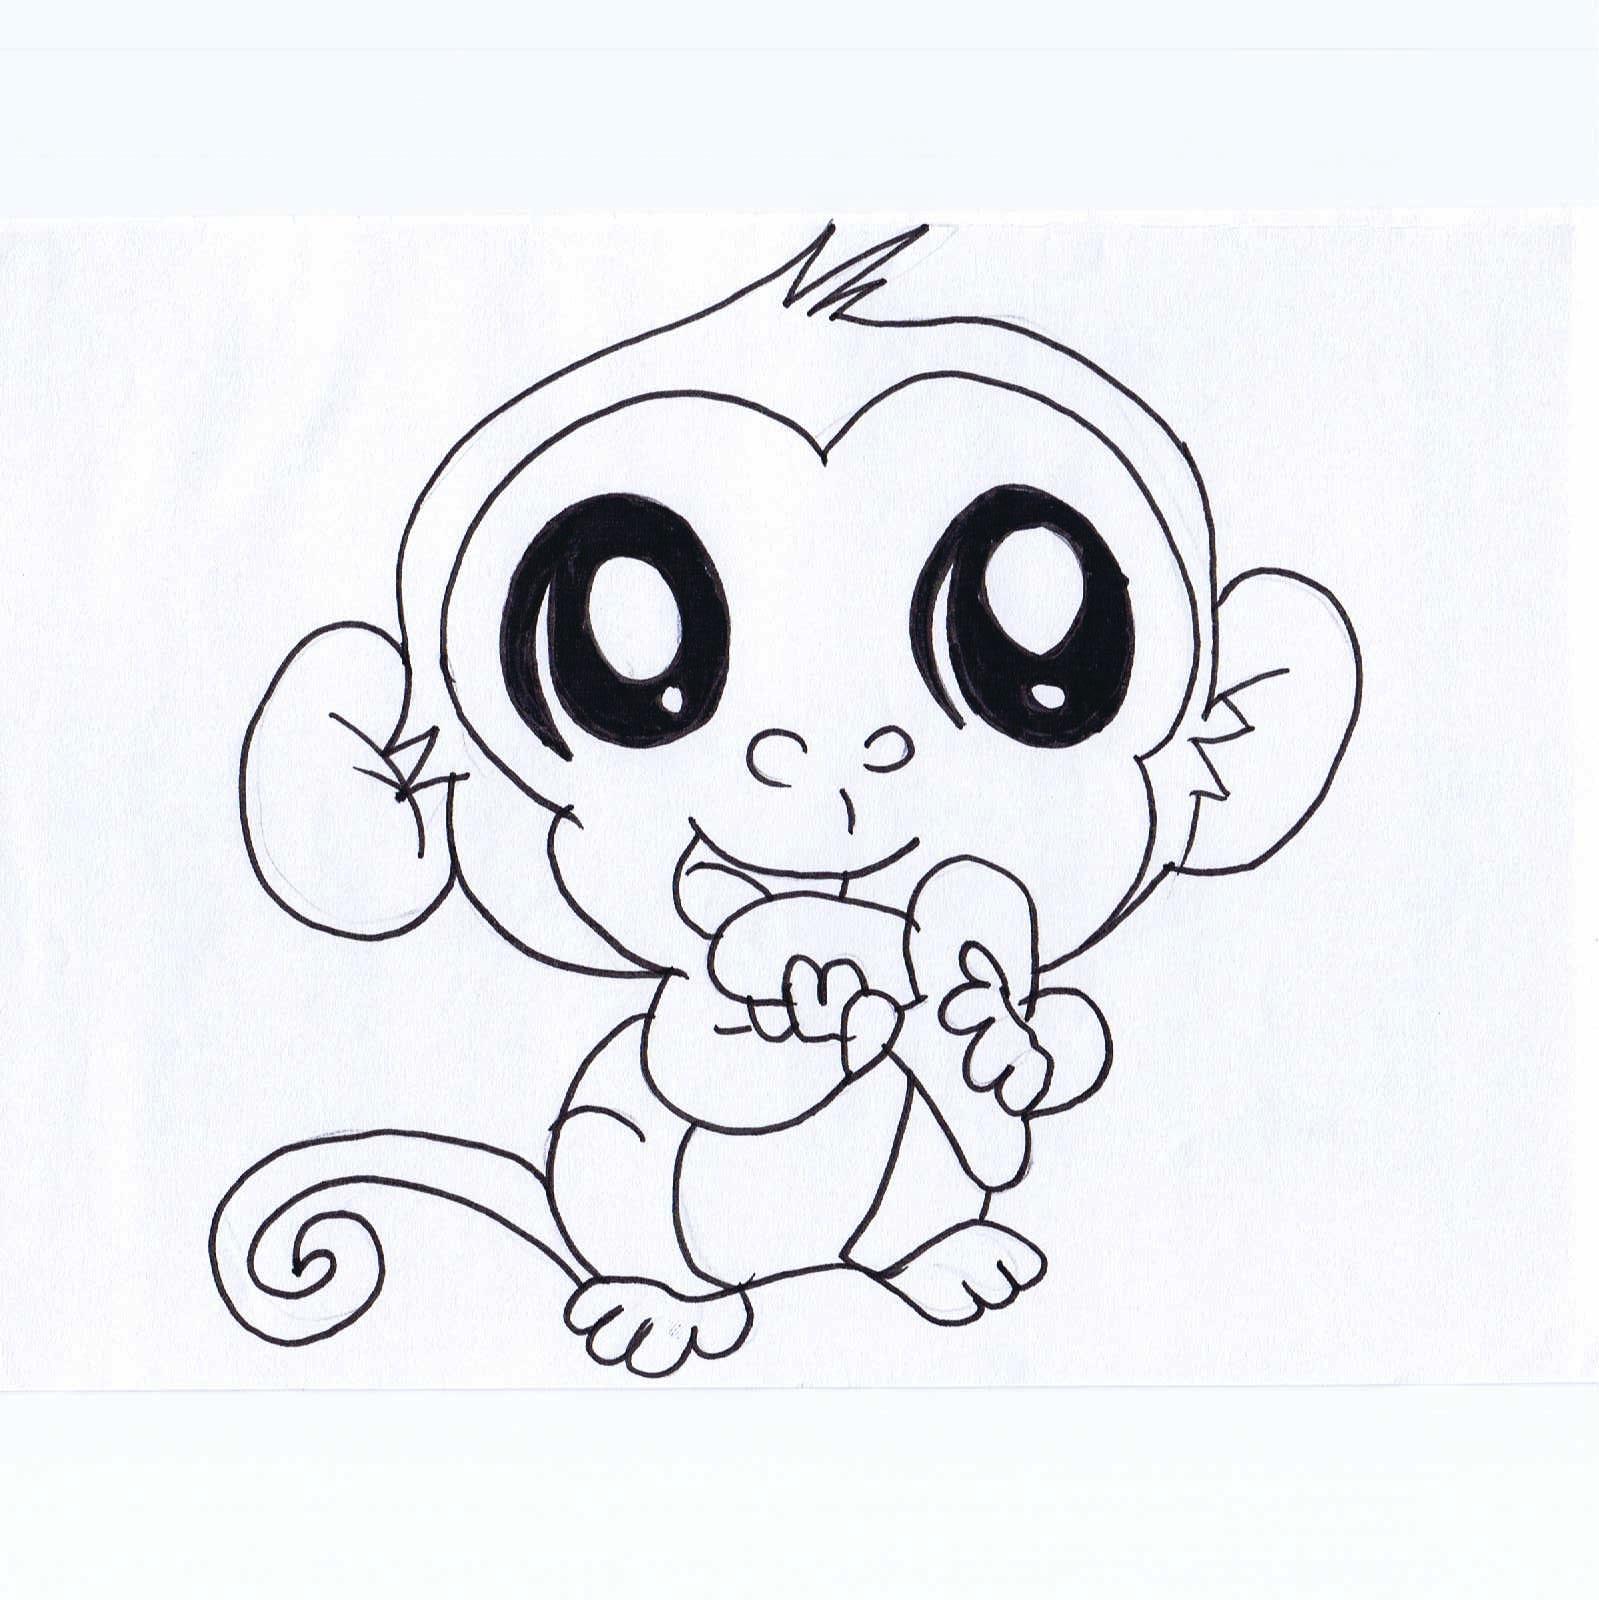 1599x1600 Drawing Cartoon Animals With Big Eyes